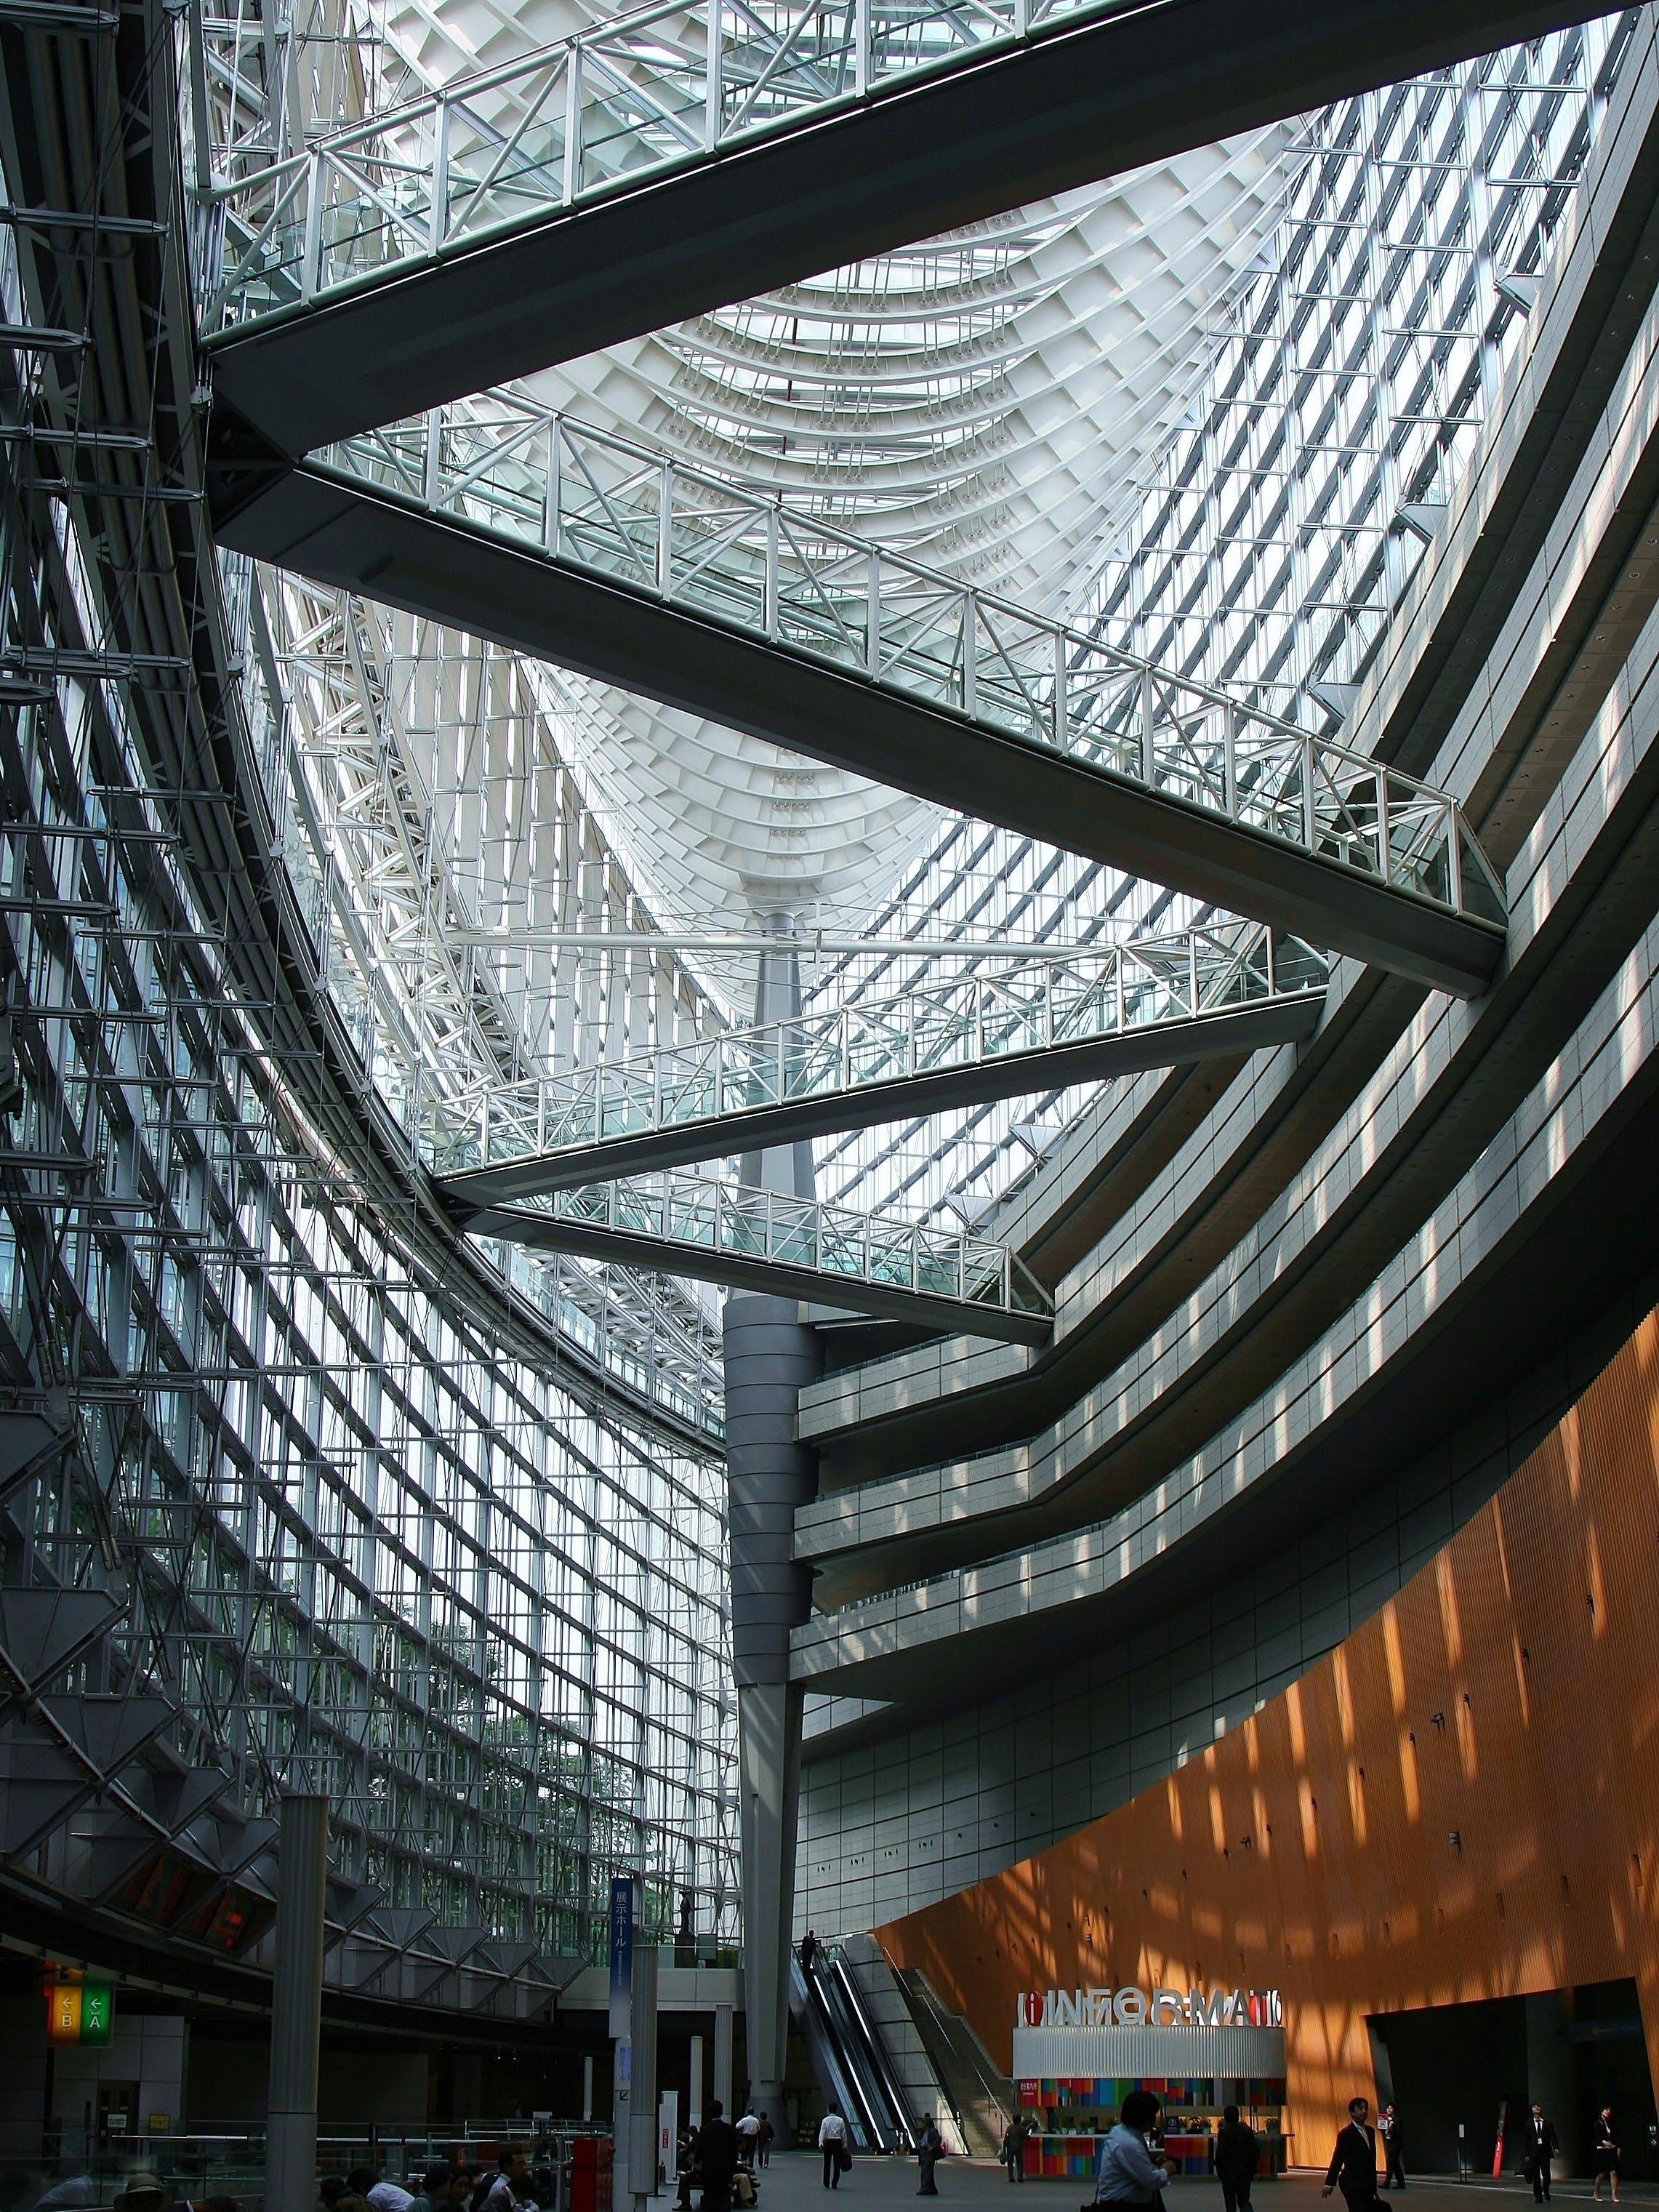 Free stock photo of light, people, building, bridge